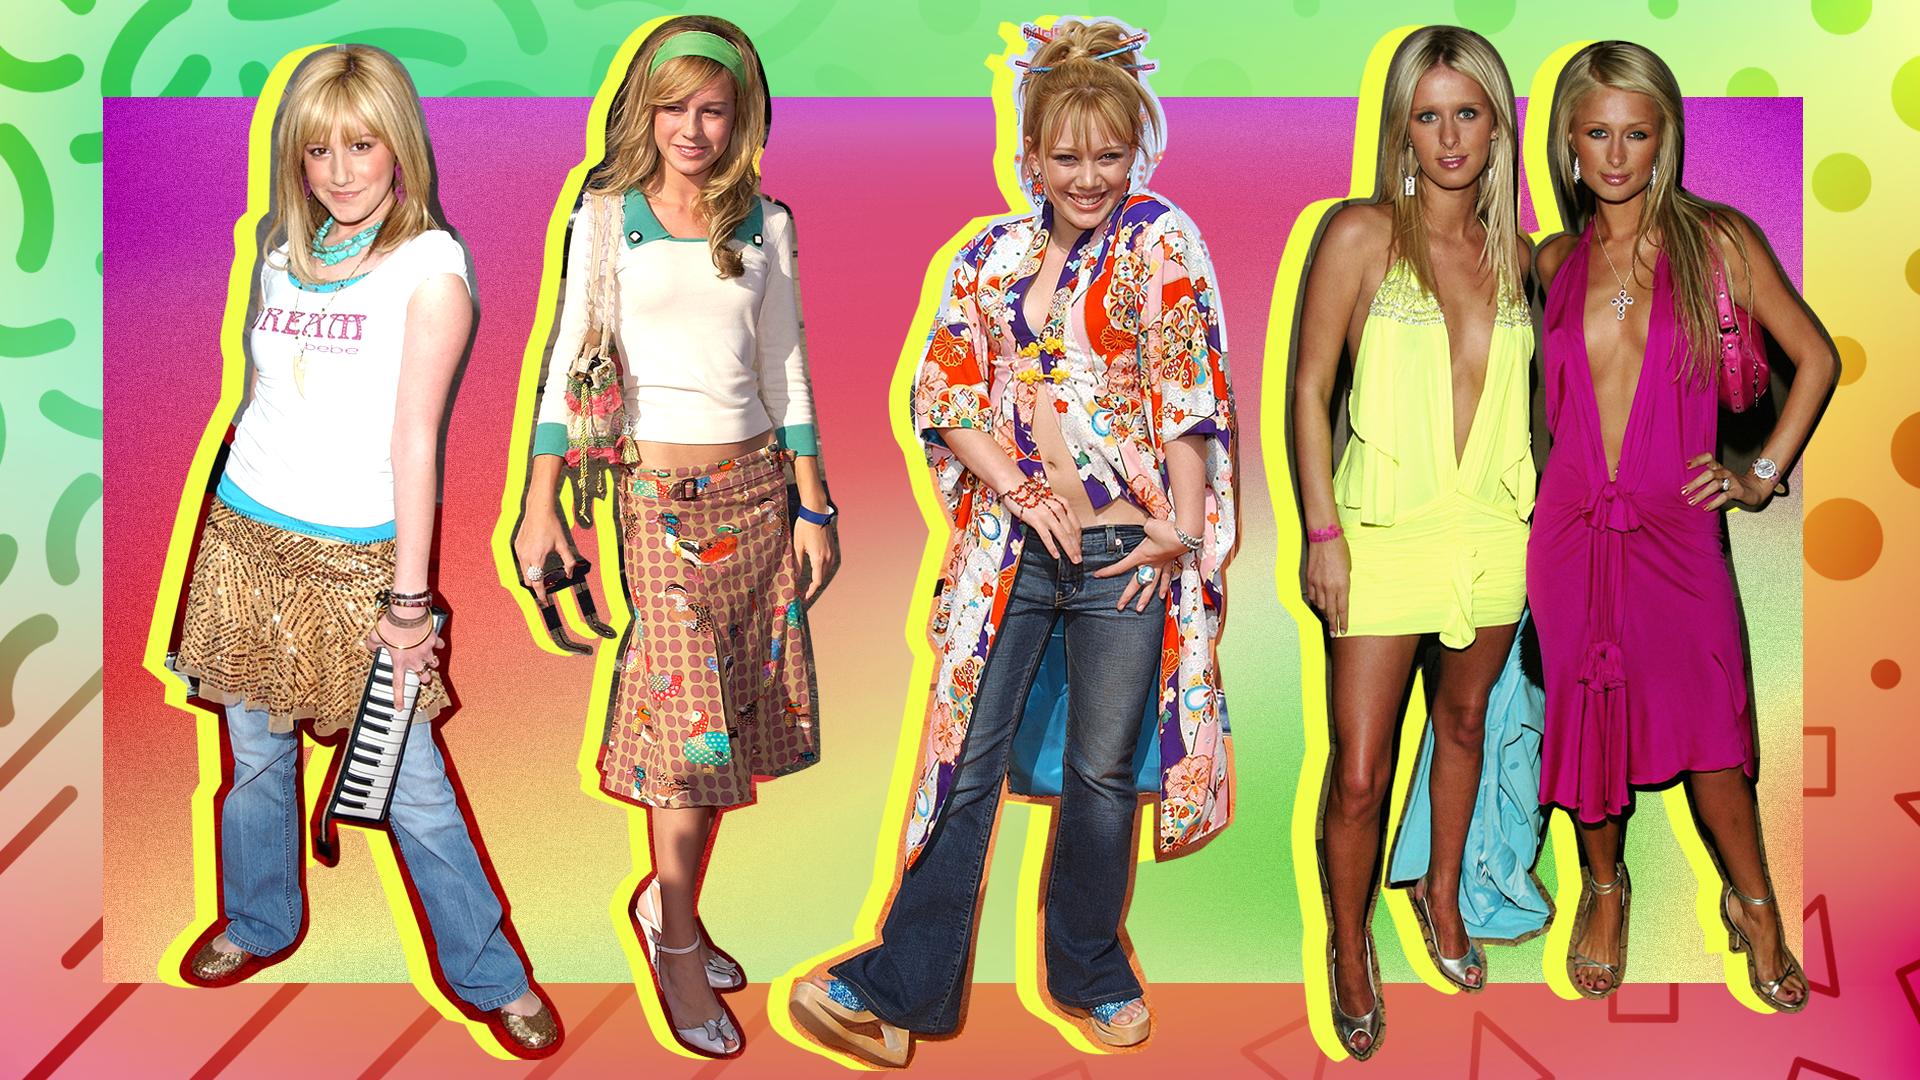 Celeb '90s and '00s Fashion